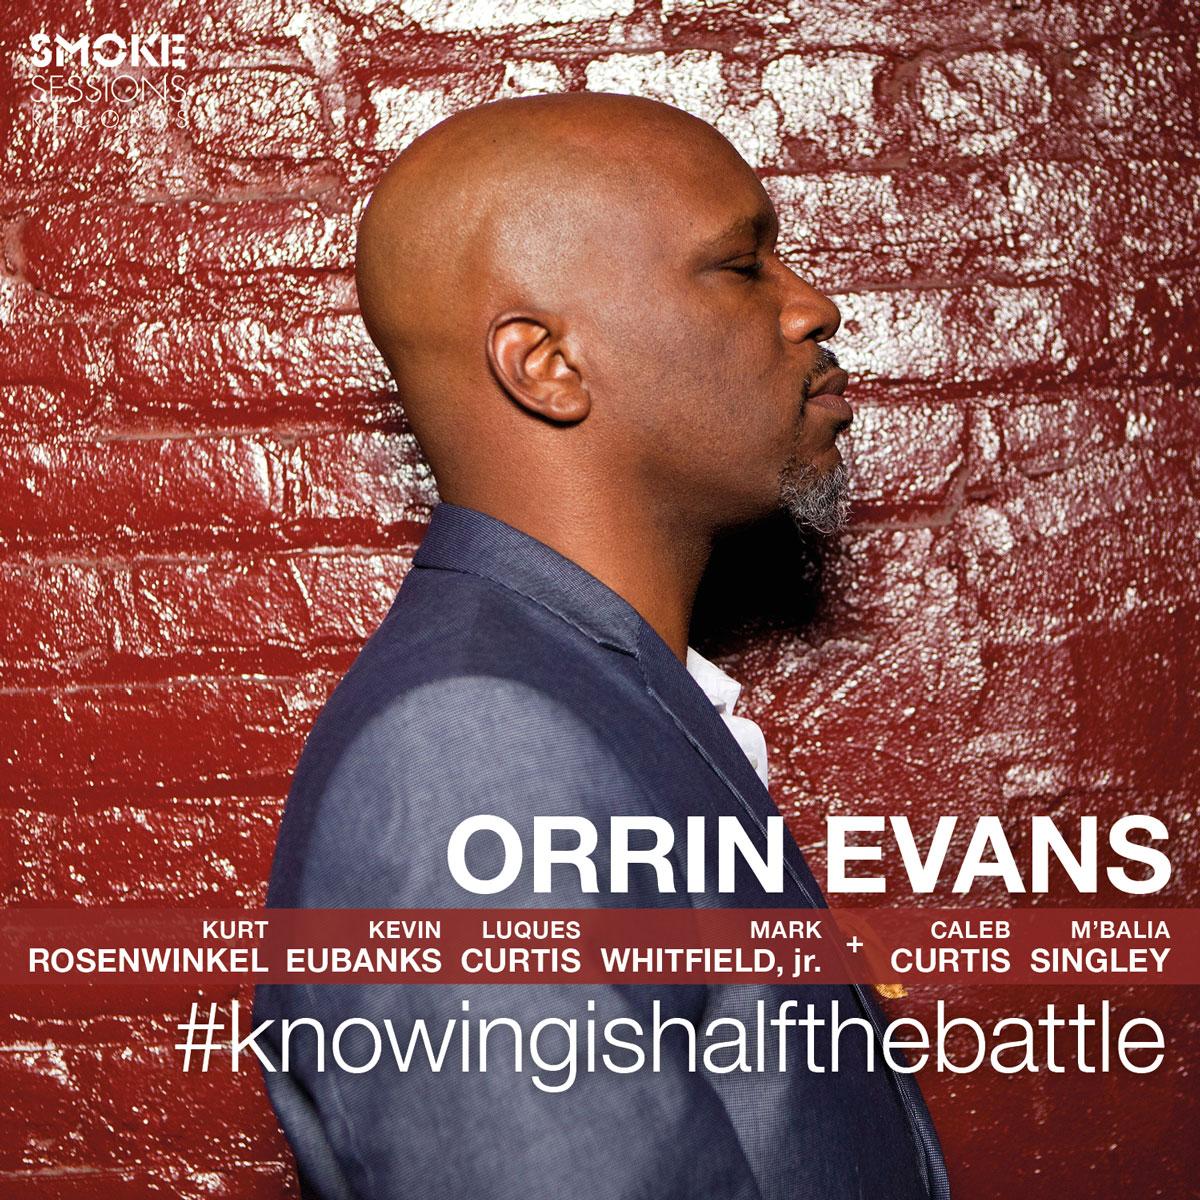 Image result for orrin evans knowing is half the battle